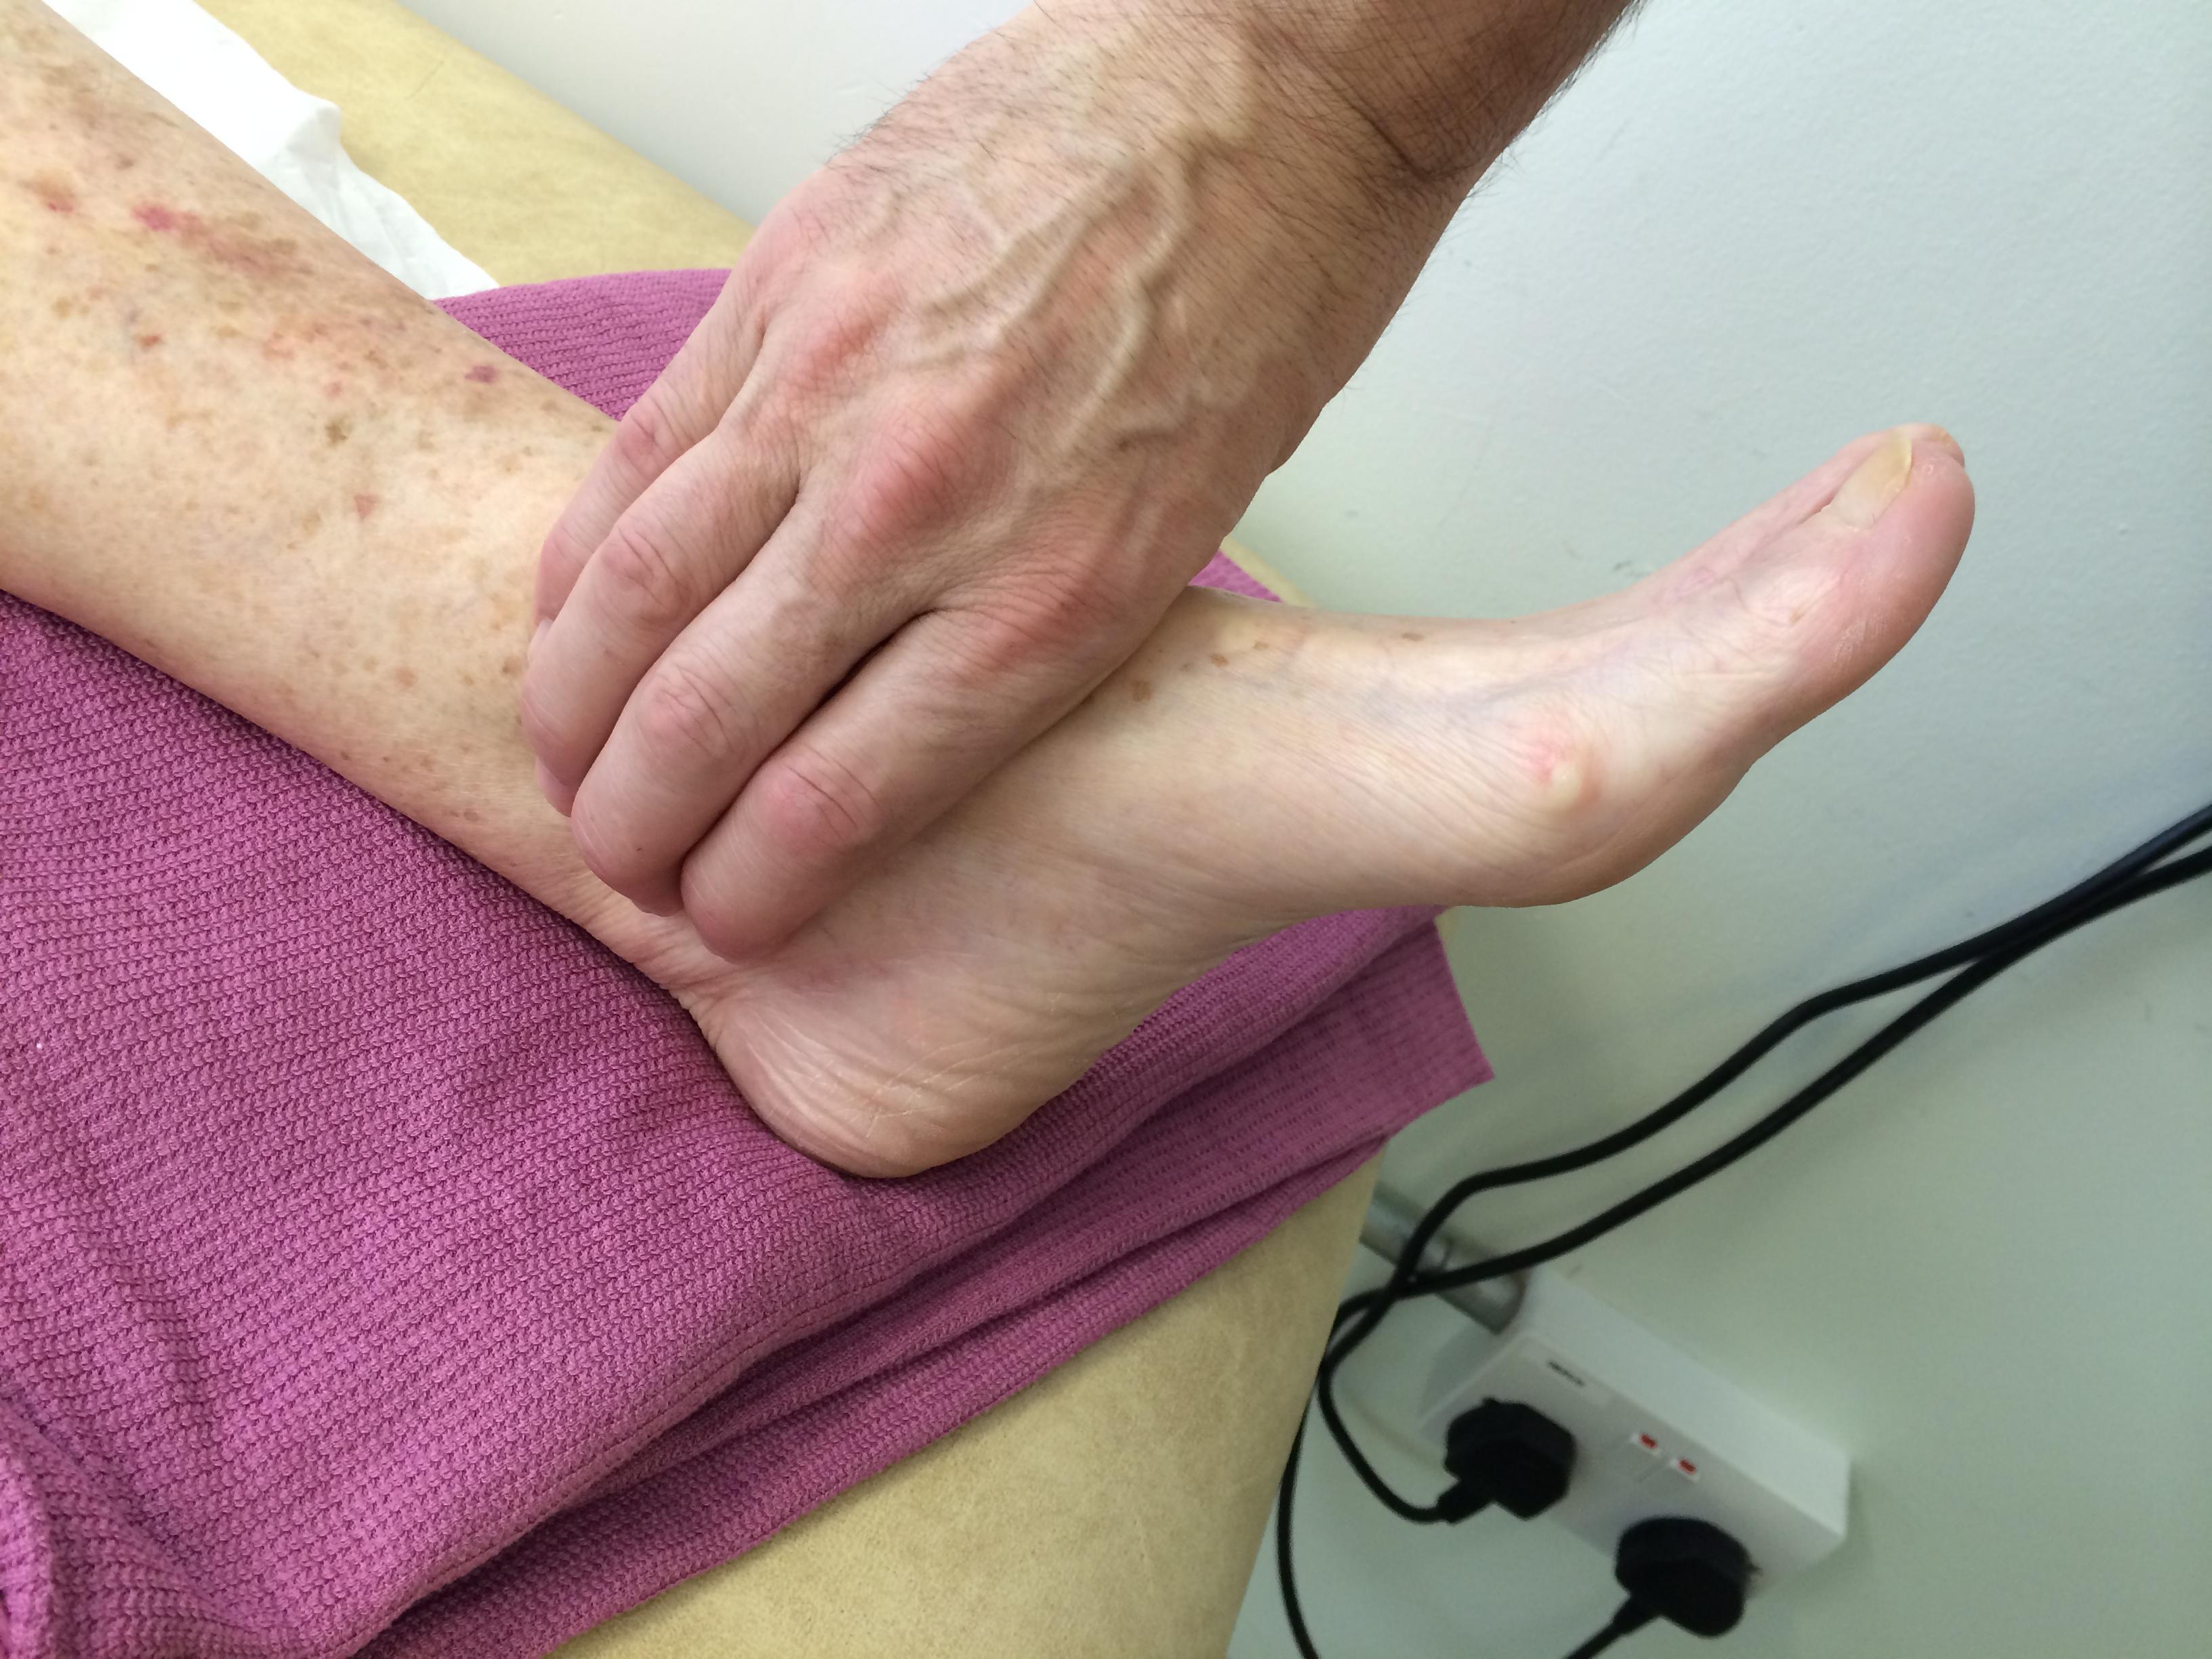 Claudication (Cramp when walking) - Vascular Society